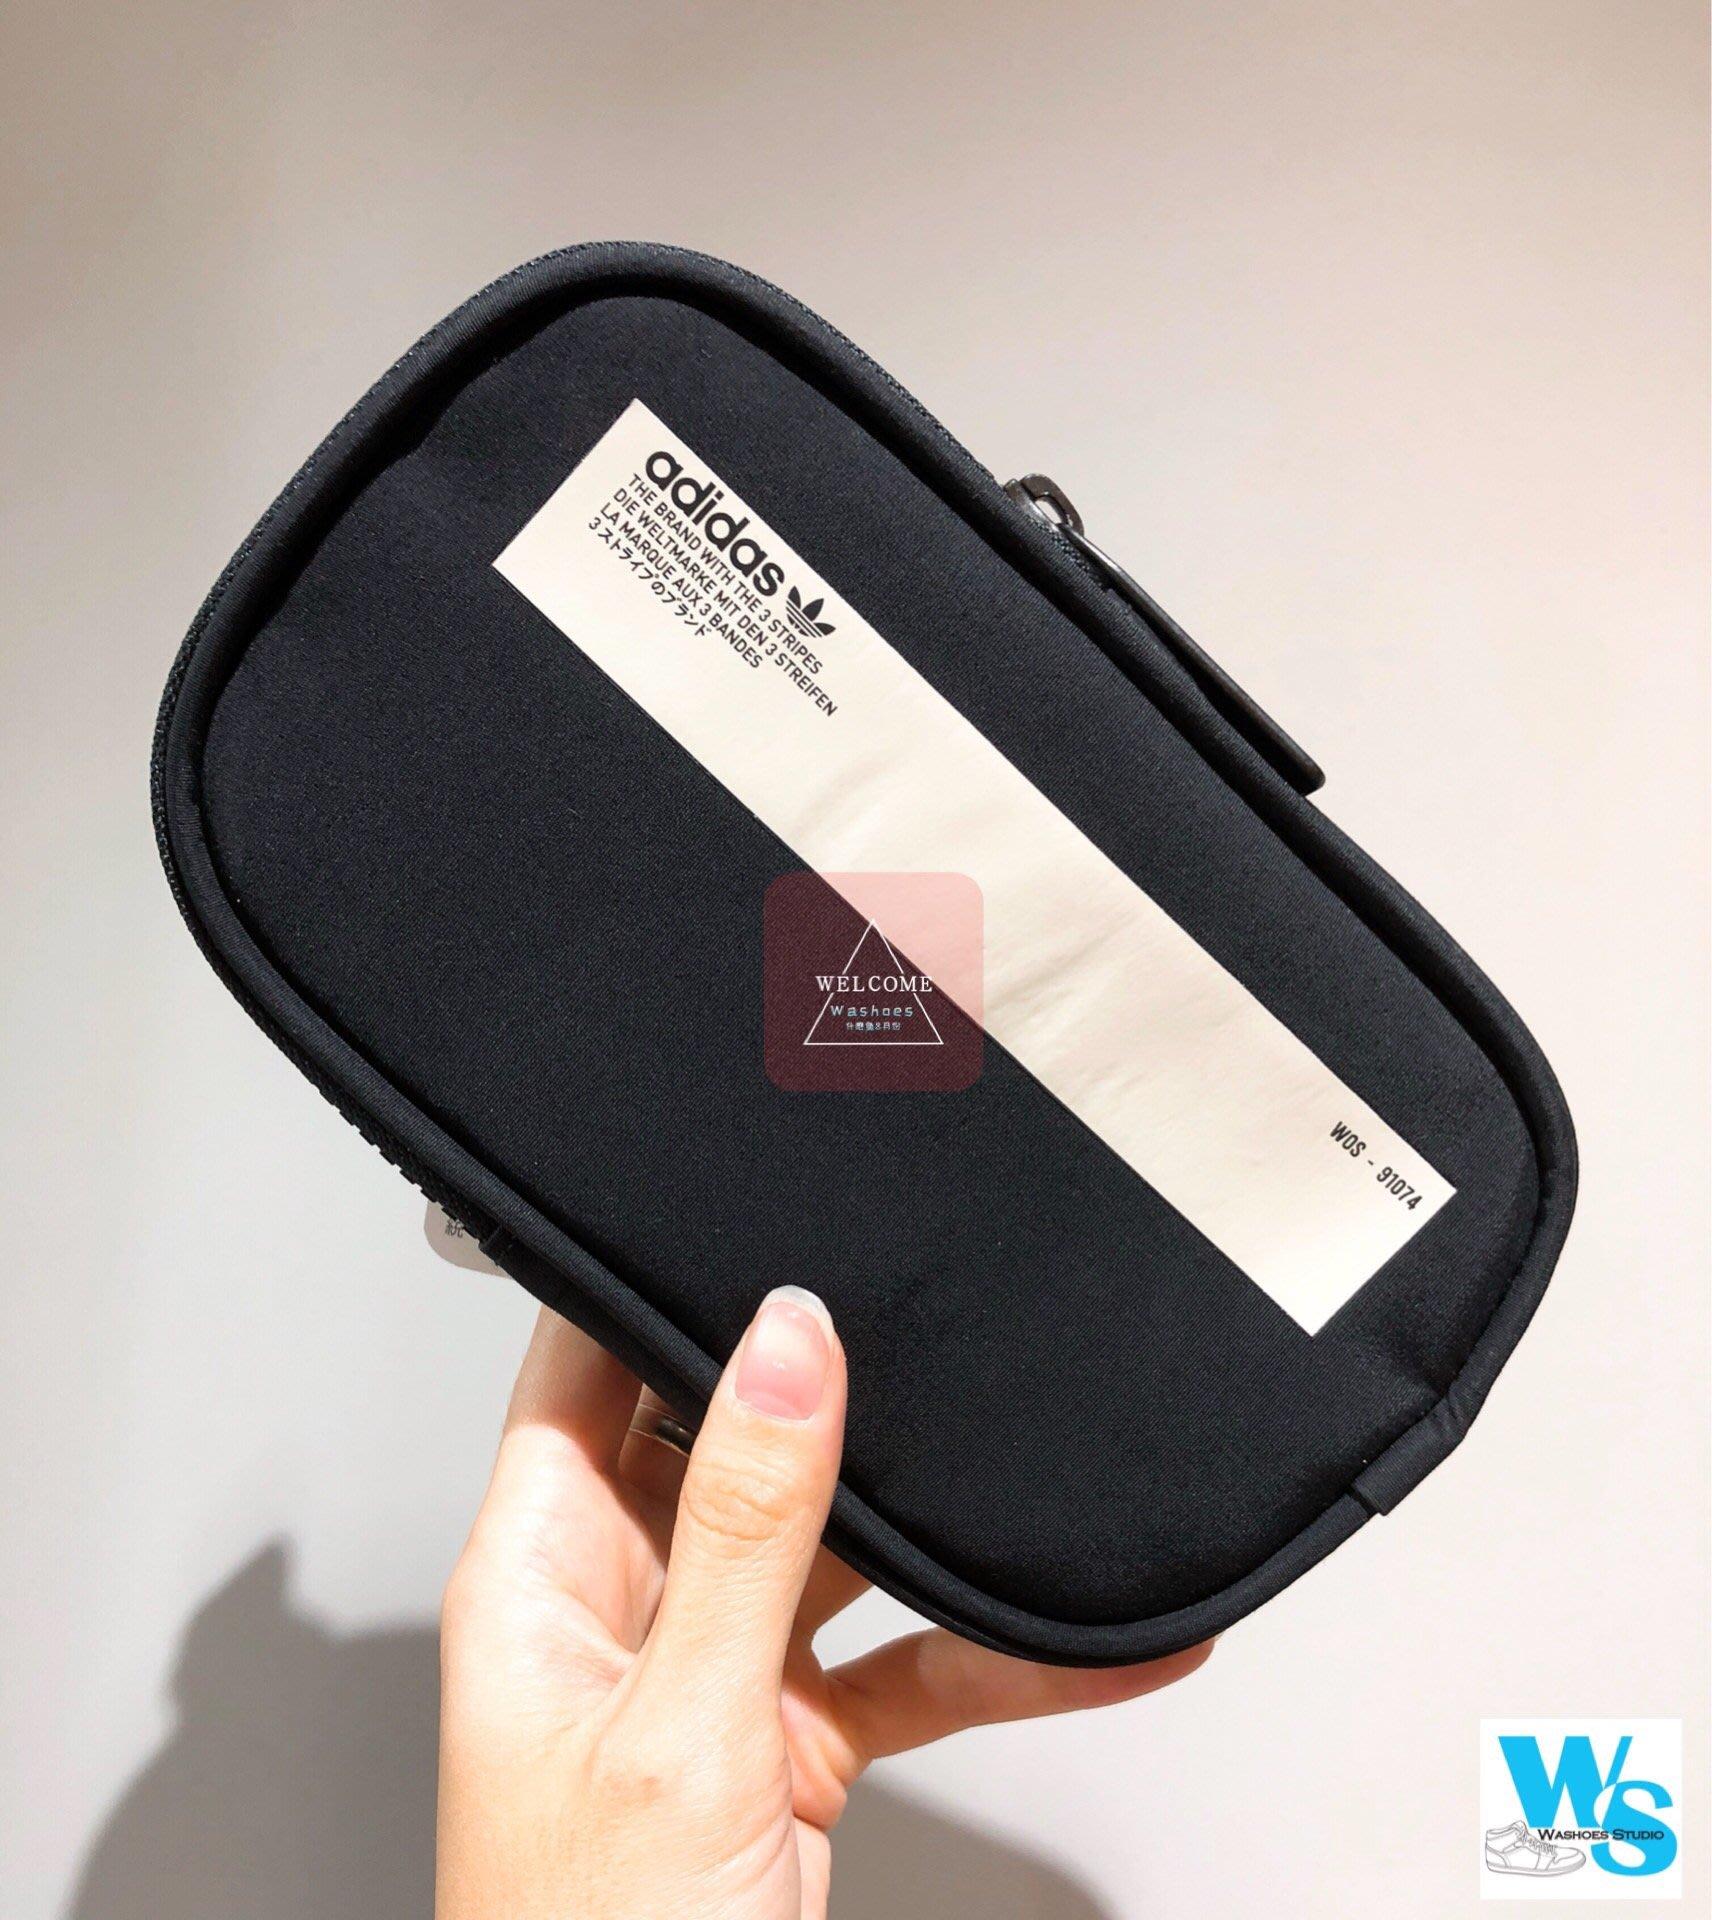 7b8d2e225 Washoes adidas NMD Pouch Bag 黑色DH3088 小掛包包包腰包方形包手機包 ...